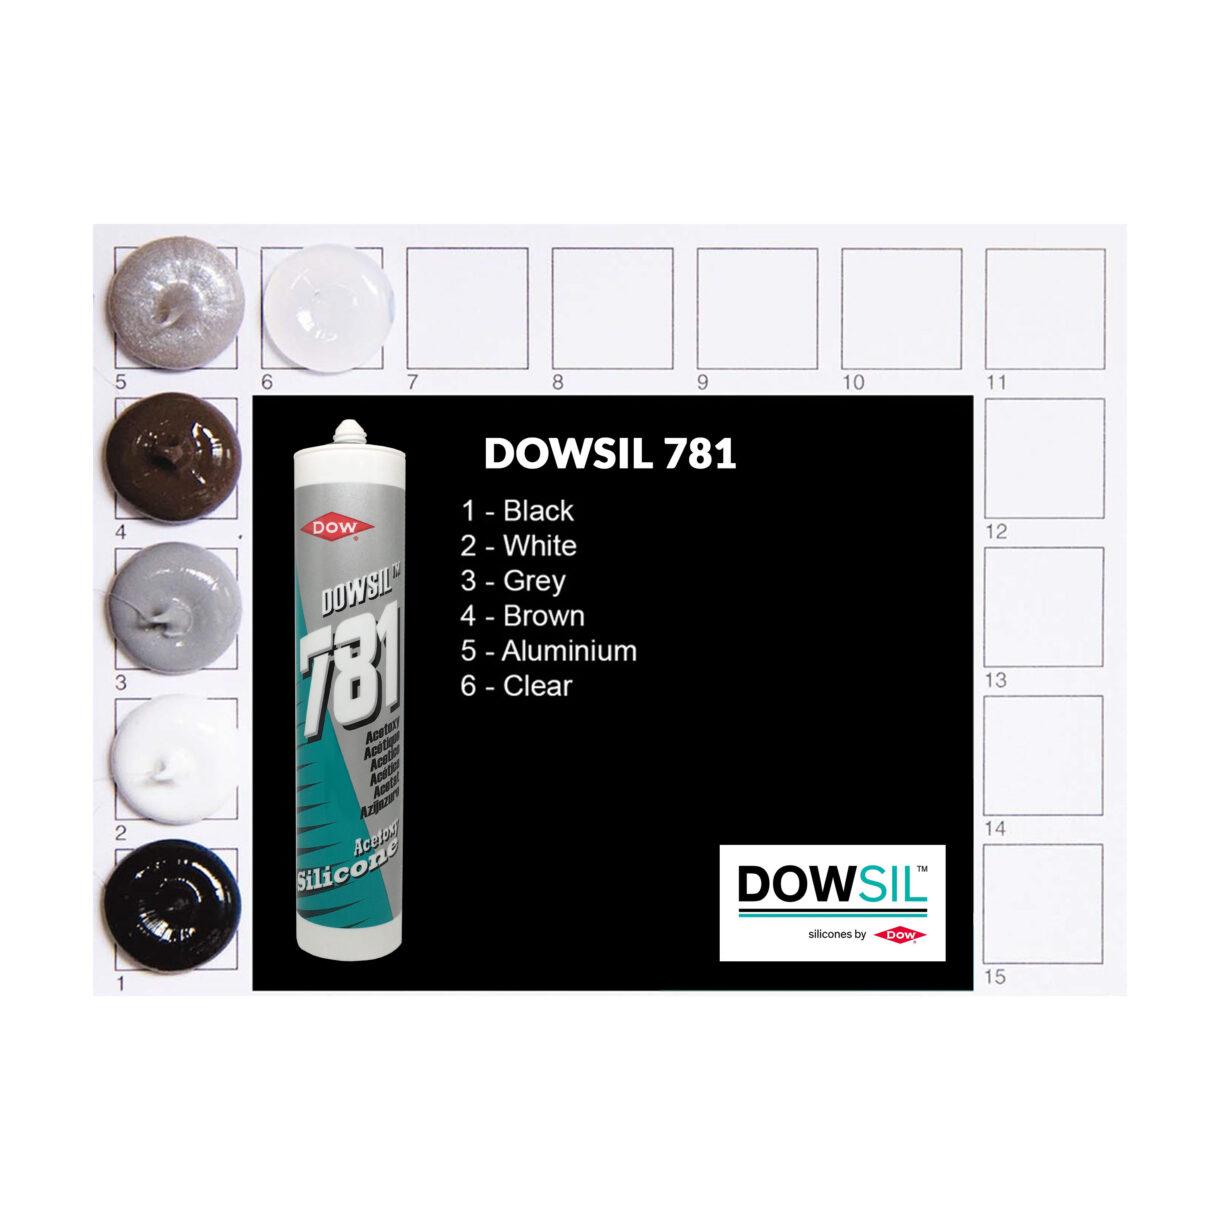 DOWSIL 781